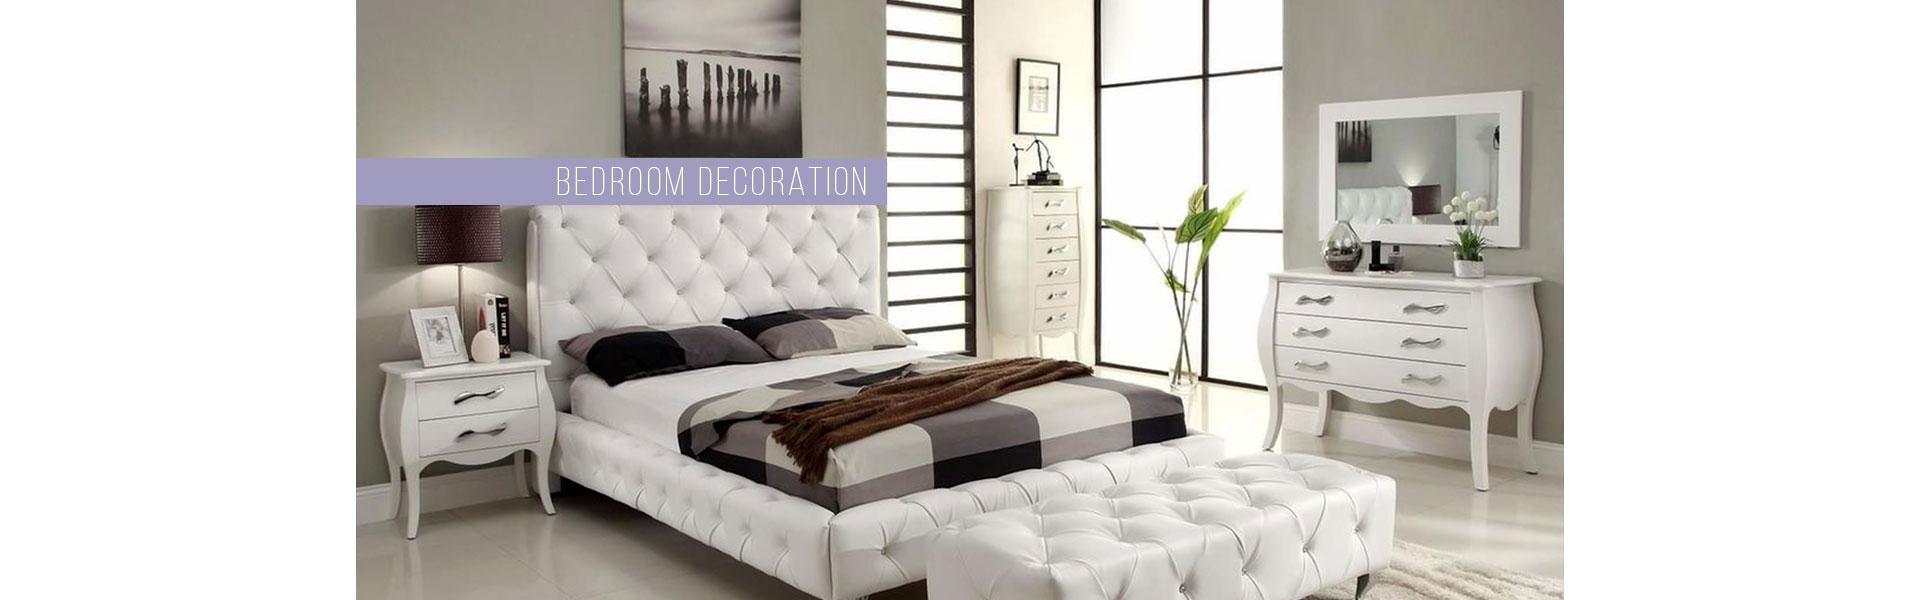 decorasion bedroom design9 - نکاتی در مورد تزیین اتاق خواب